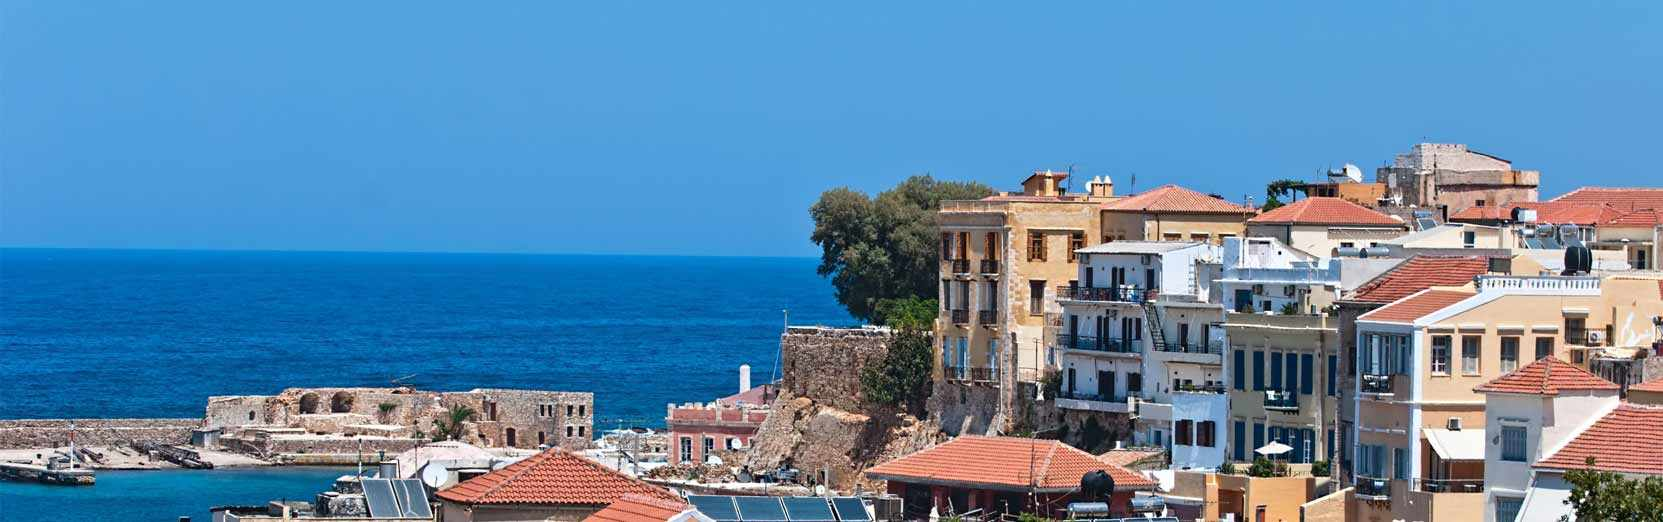 Auto mieten in Kreta